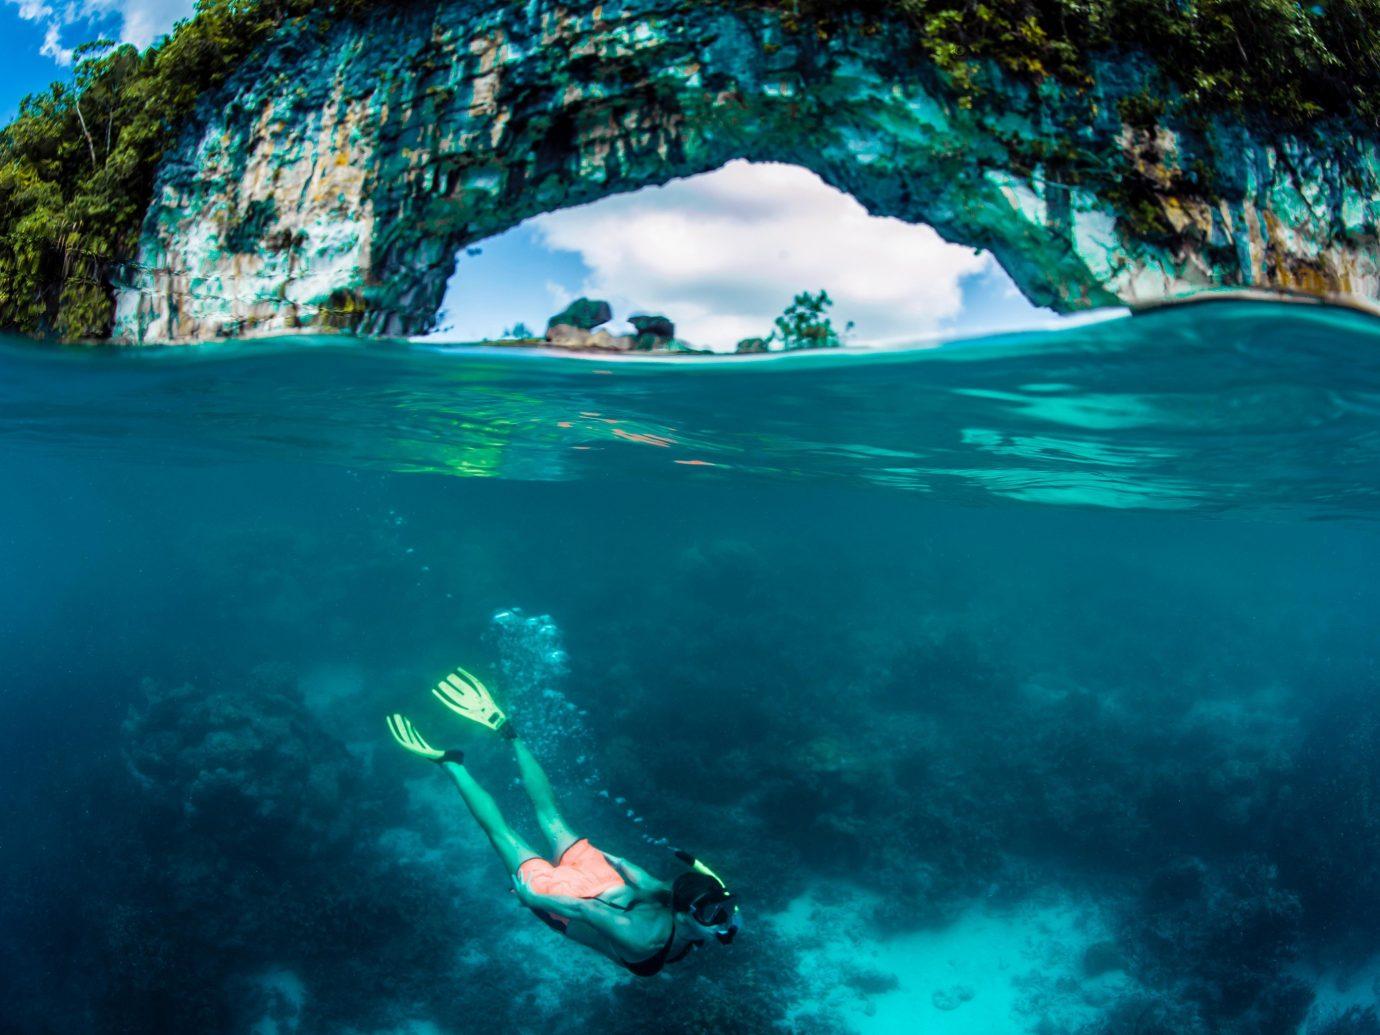 Islands Trip Ideas water Sport Nature outdoor person water sport underwater Sea freediving marine biology Ocean underwater diving Lagoon snorkeling blue wave diving swimming